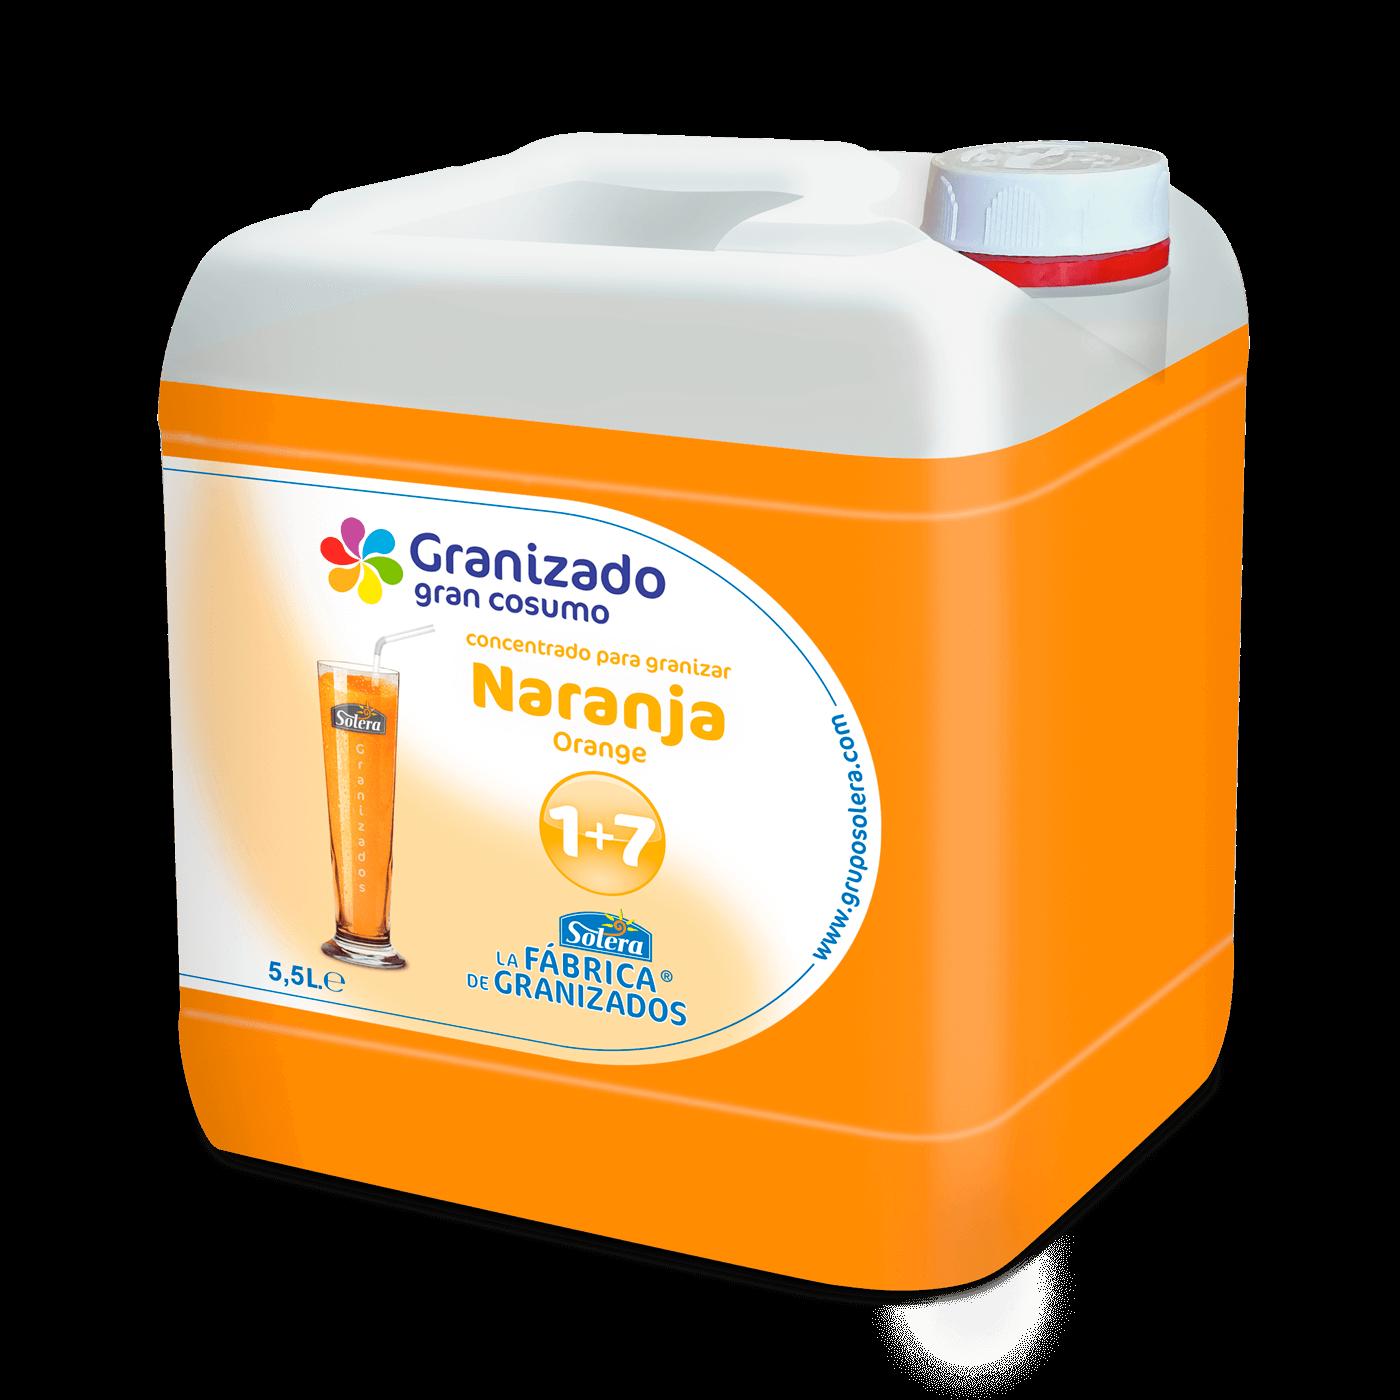 Garrafa naranja